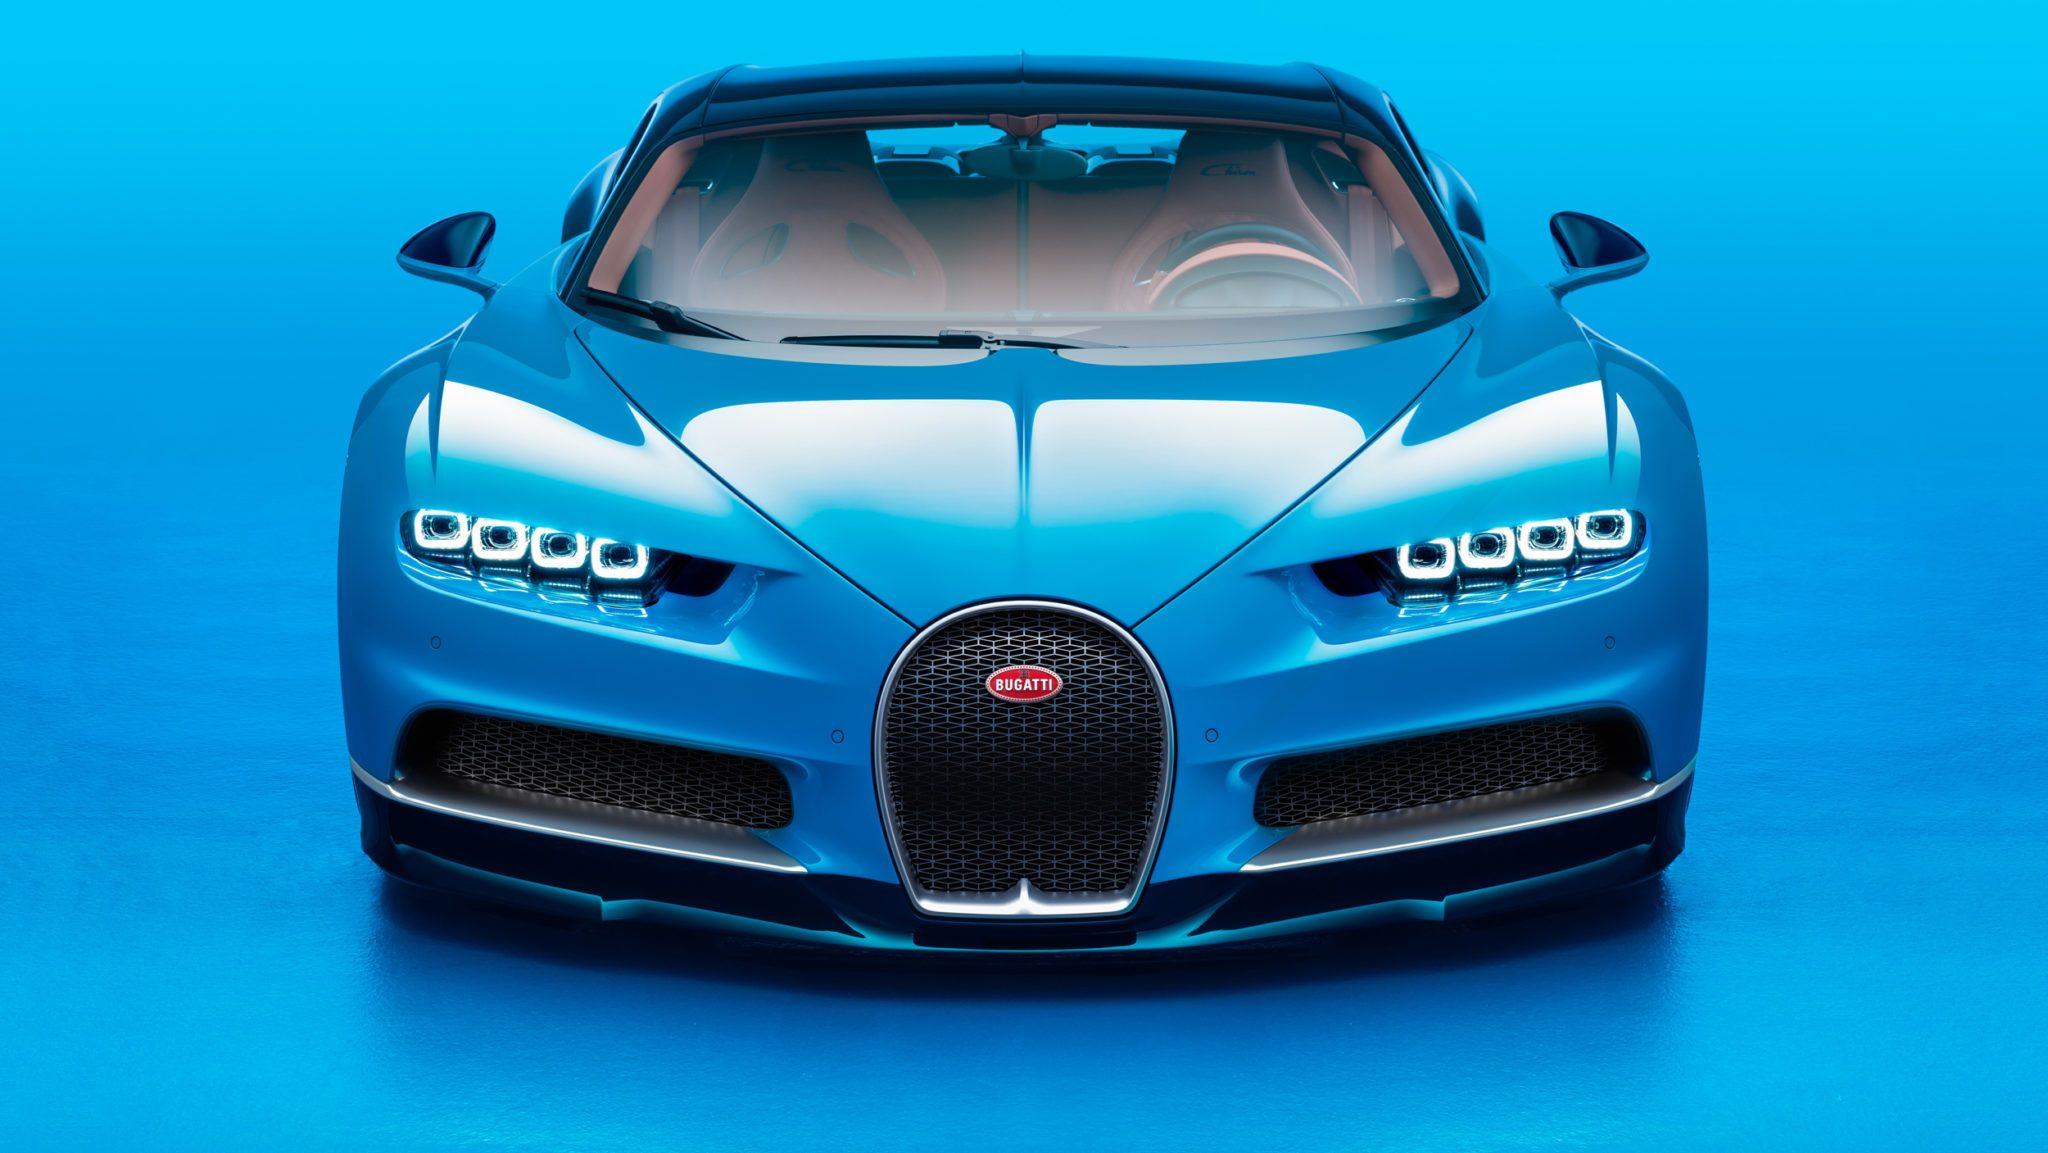 bugatti-chiron-02-1 Stunning Bugatti Veyron Price In Brazil Cars Trend